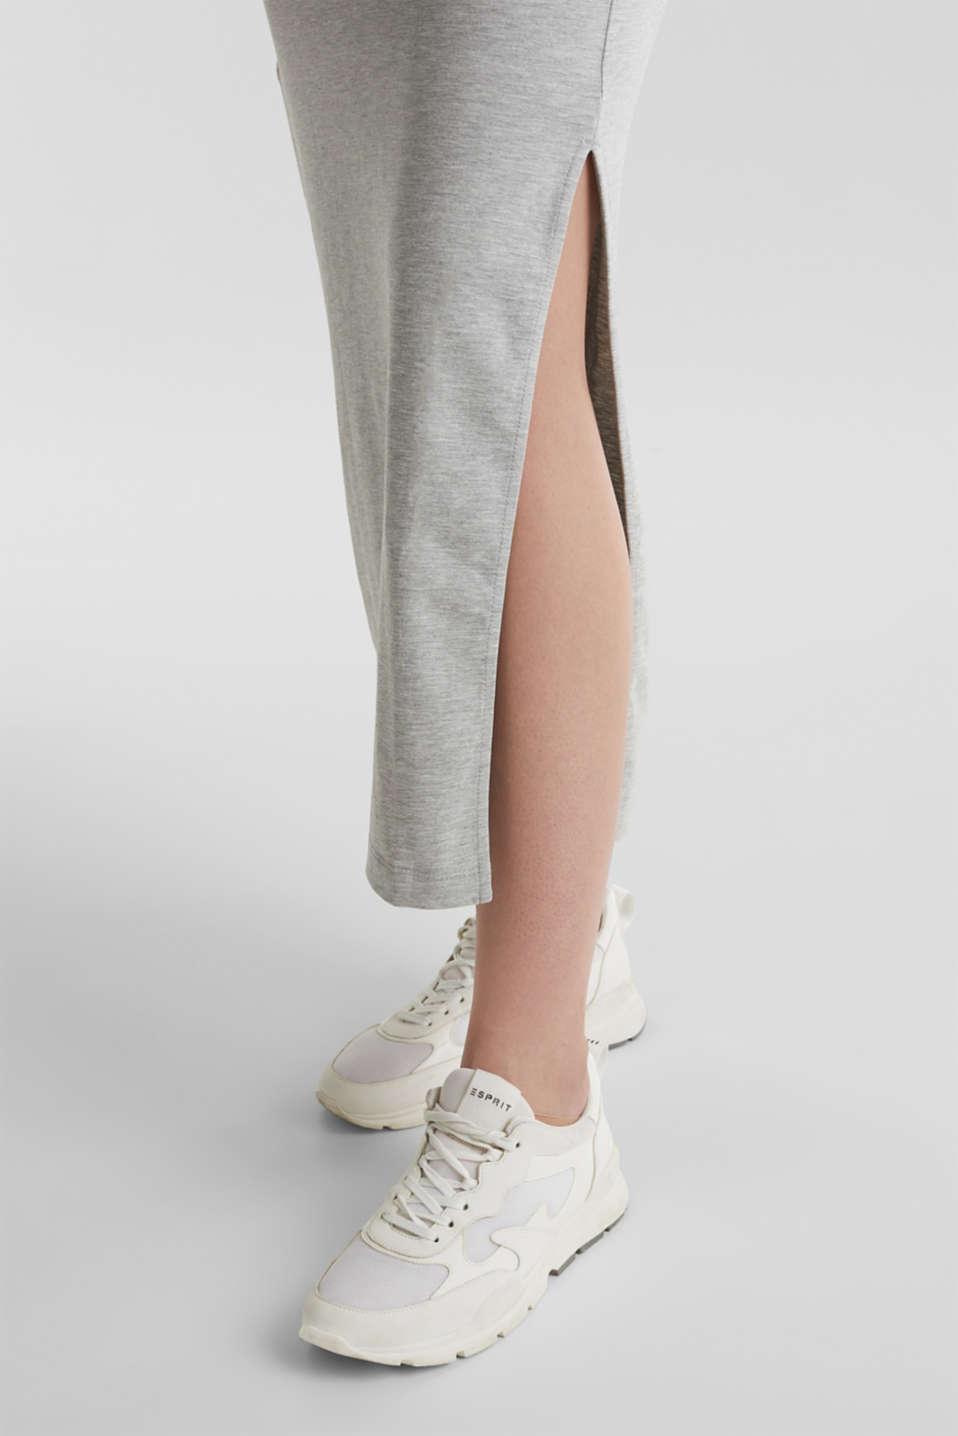 Stretch jersey skirt, LIGHT GREY 5, detail image number 2